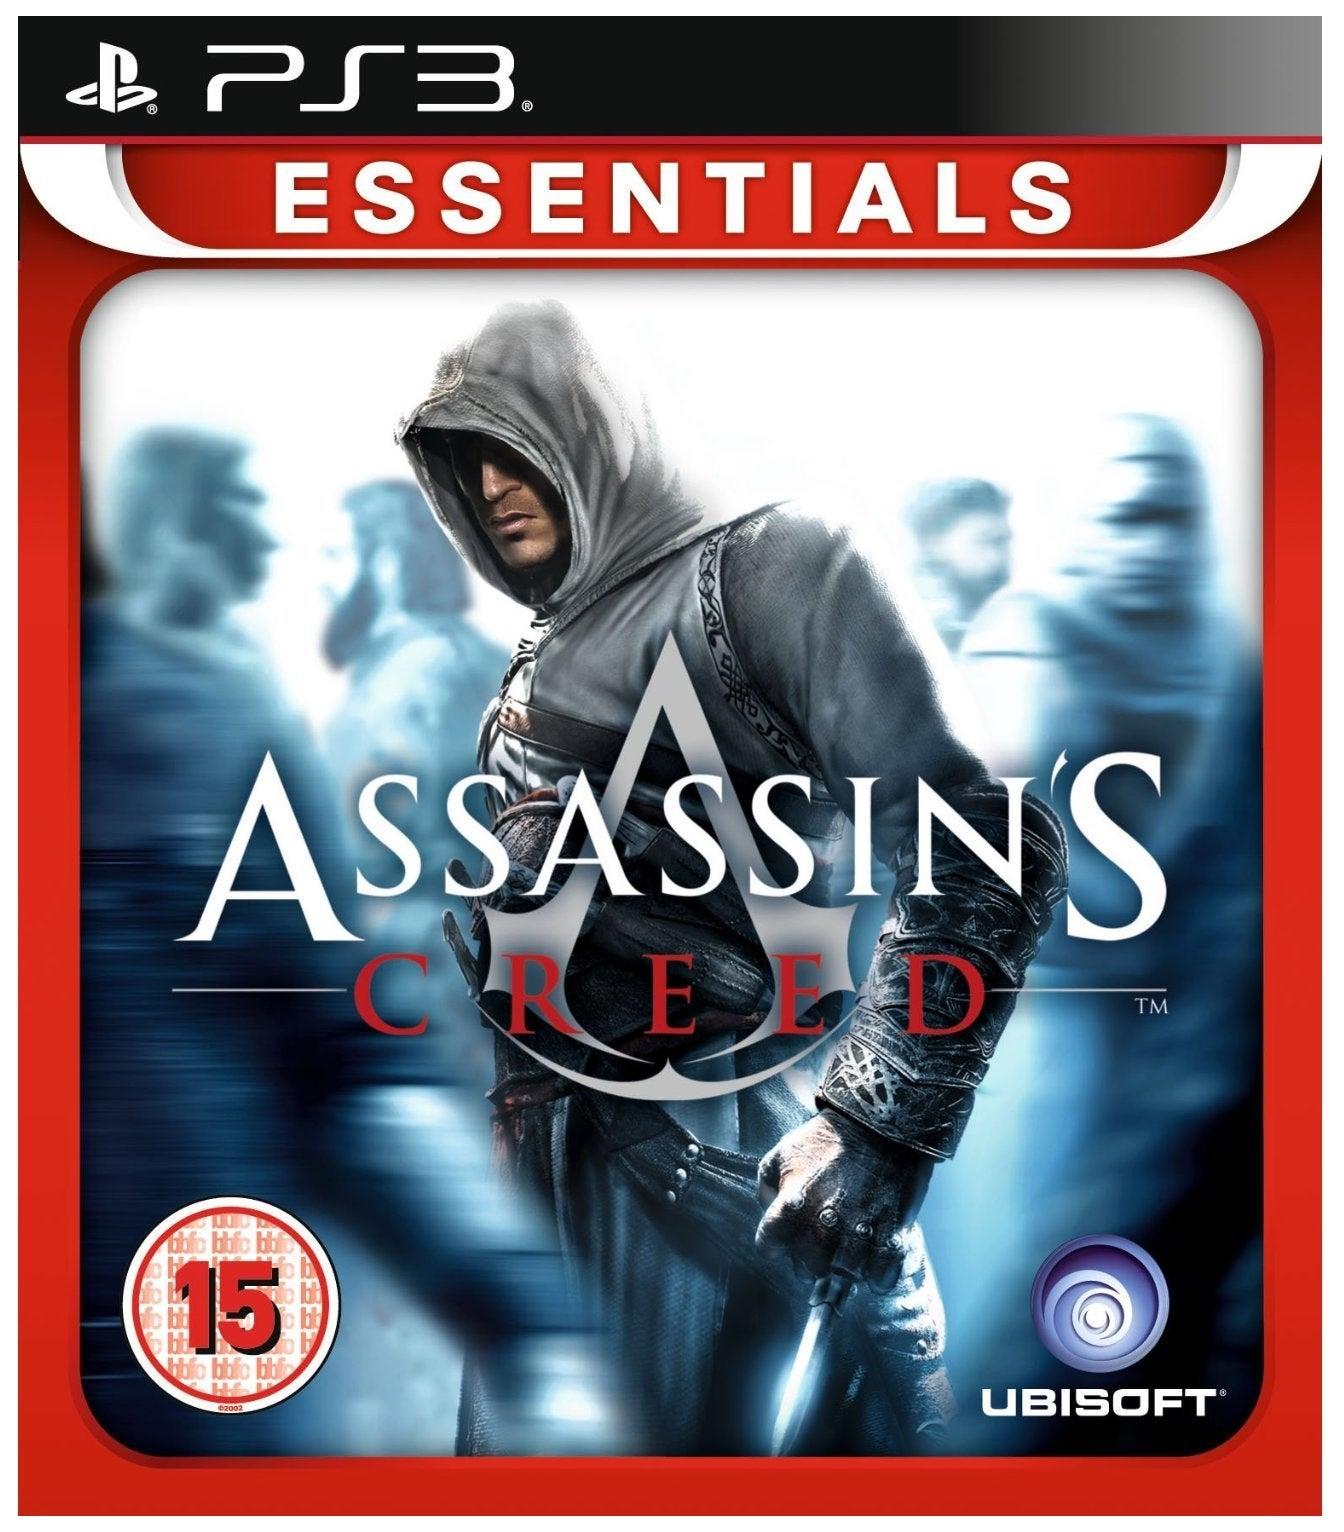 Ubisoft Assassins Creed Essentials PS3 Playstation 3 Game